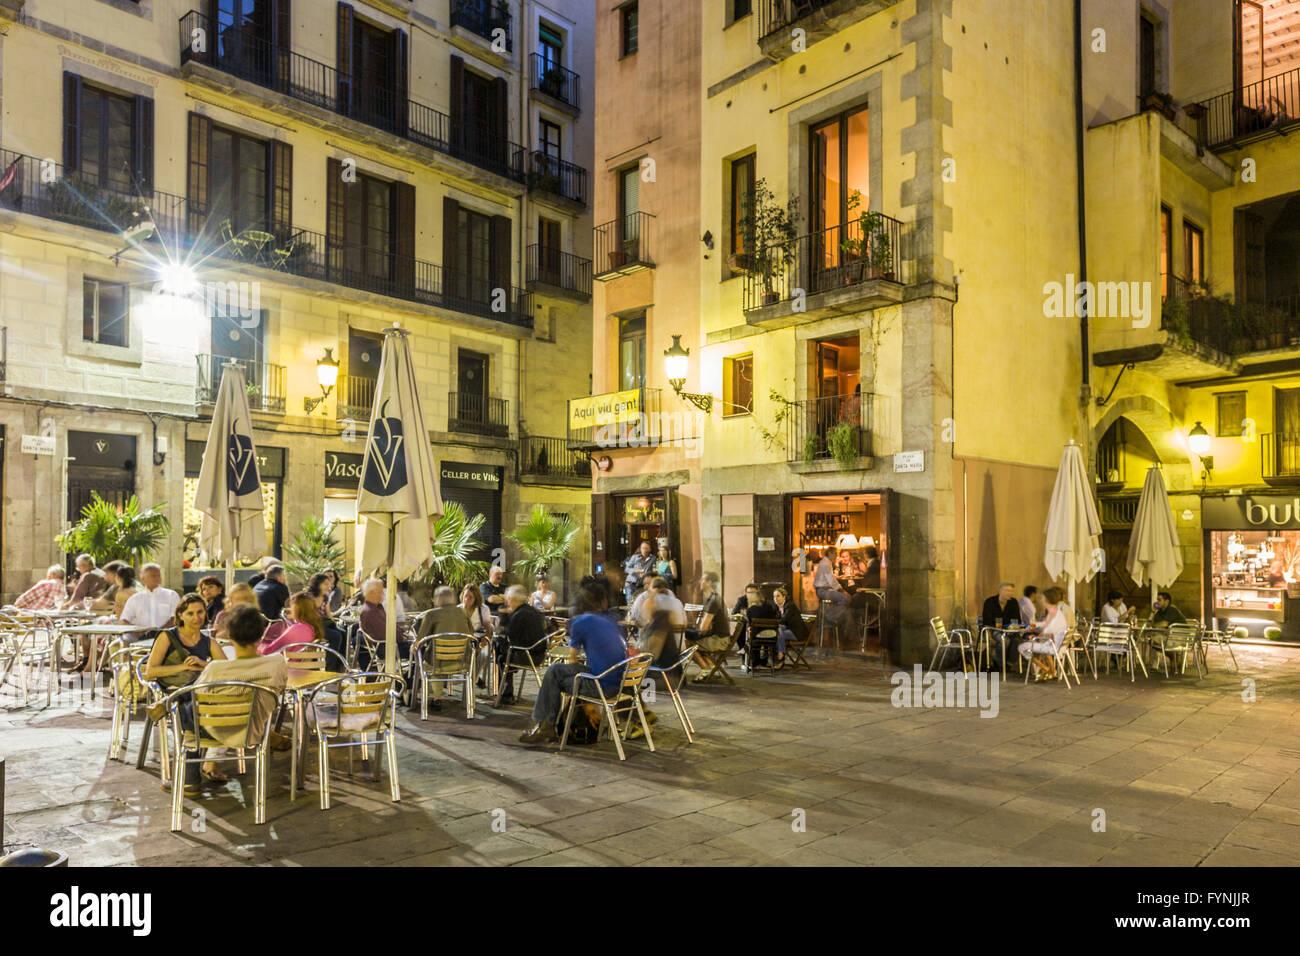 La Ribera, Plaza de Santa Maria, Straßencafés am Abend, Barcelona Stockbild